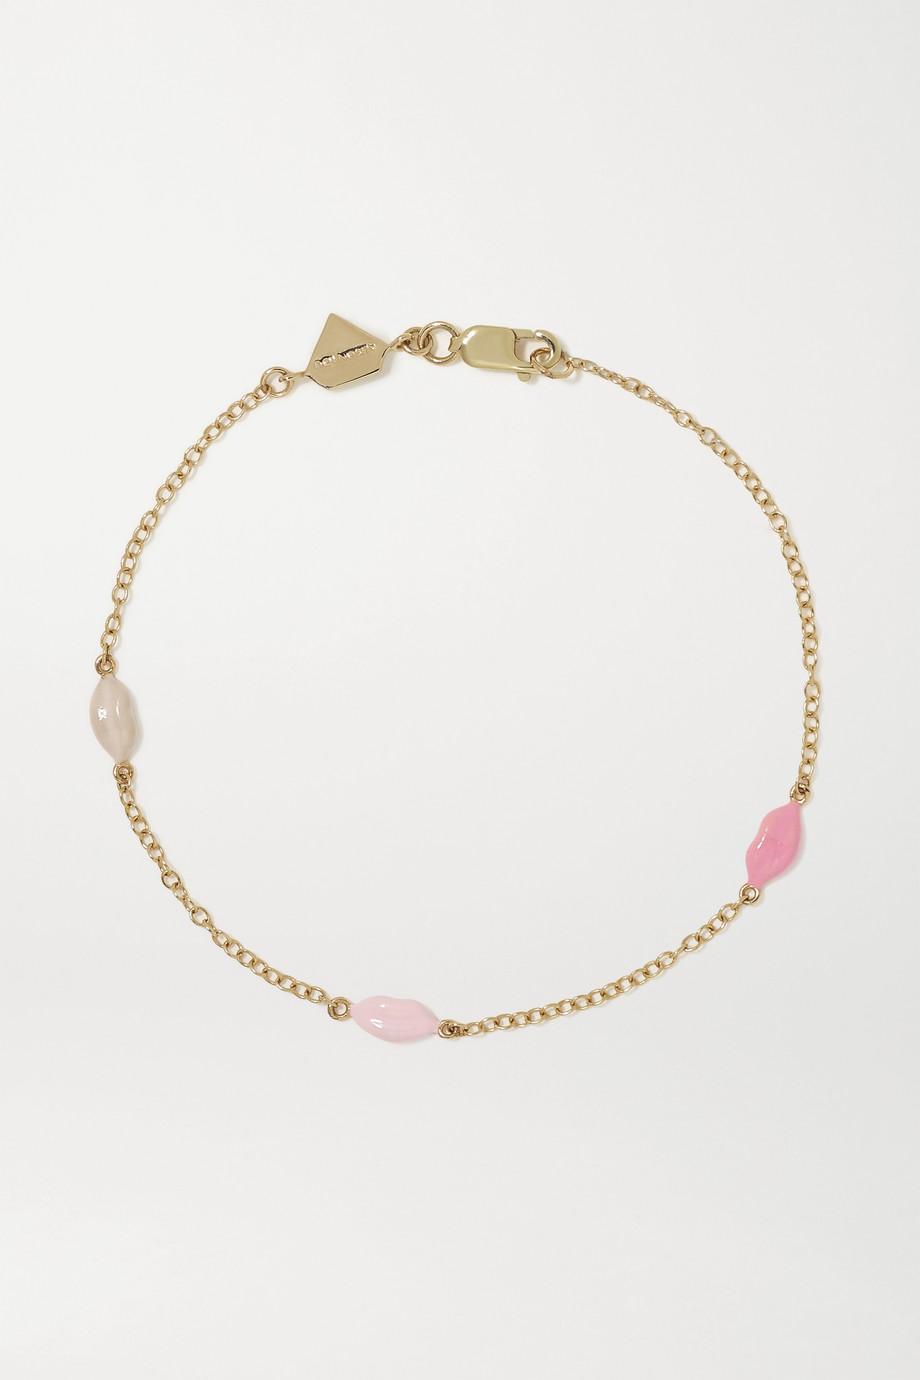 Alison Lou Mini Lip By The Yard Armband aus 14 Karat Gold mit Emaille